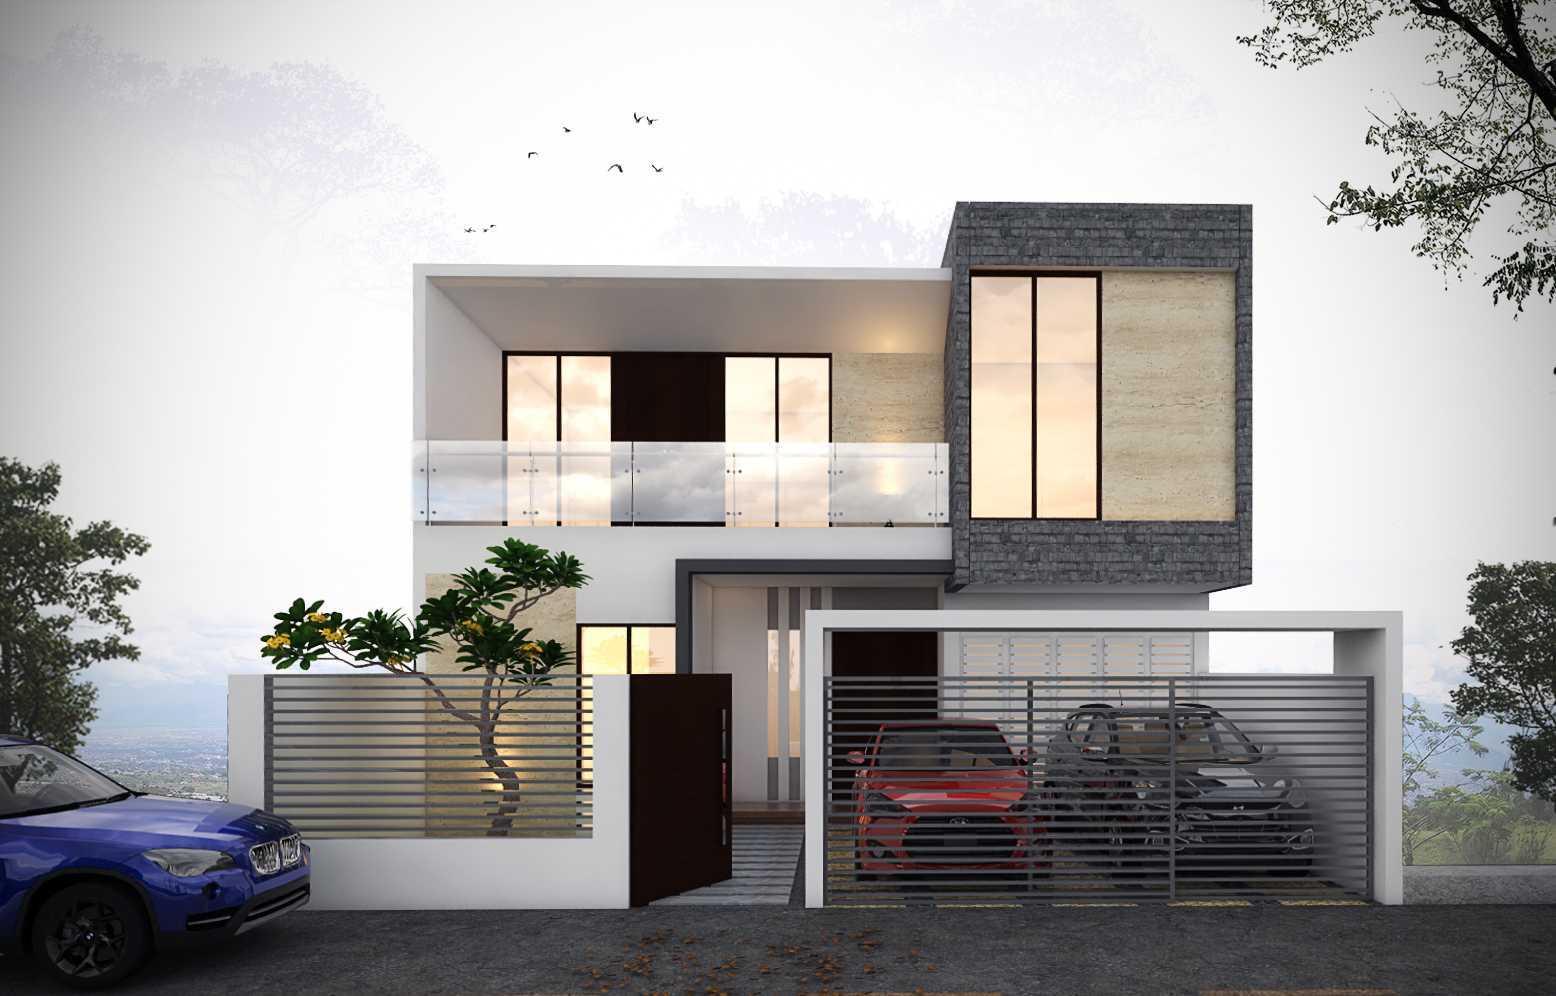 Sabio Design Minimalist House Taman Kopo Indah 1 Jl. Taman Kopo Indah I, Margahayu Sel., Kec. Margahayu, Bandung, Jawa Barat, Indonesia Unnamed Road, Margahayu Sel., Kec. Margahayu, Bandung, Jawa Barat 40226, Indonesia Sabio-Design-Minimalist-House-Taman-Kopo-Indah-1  119836